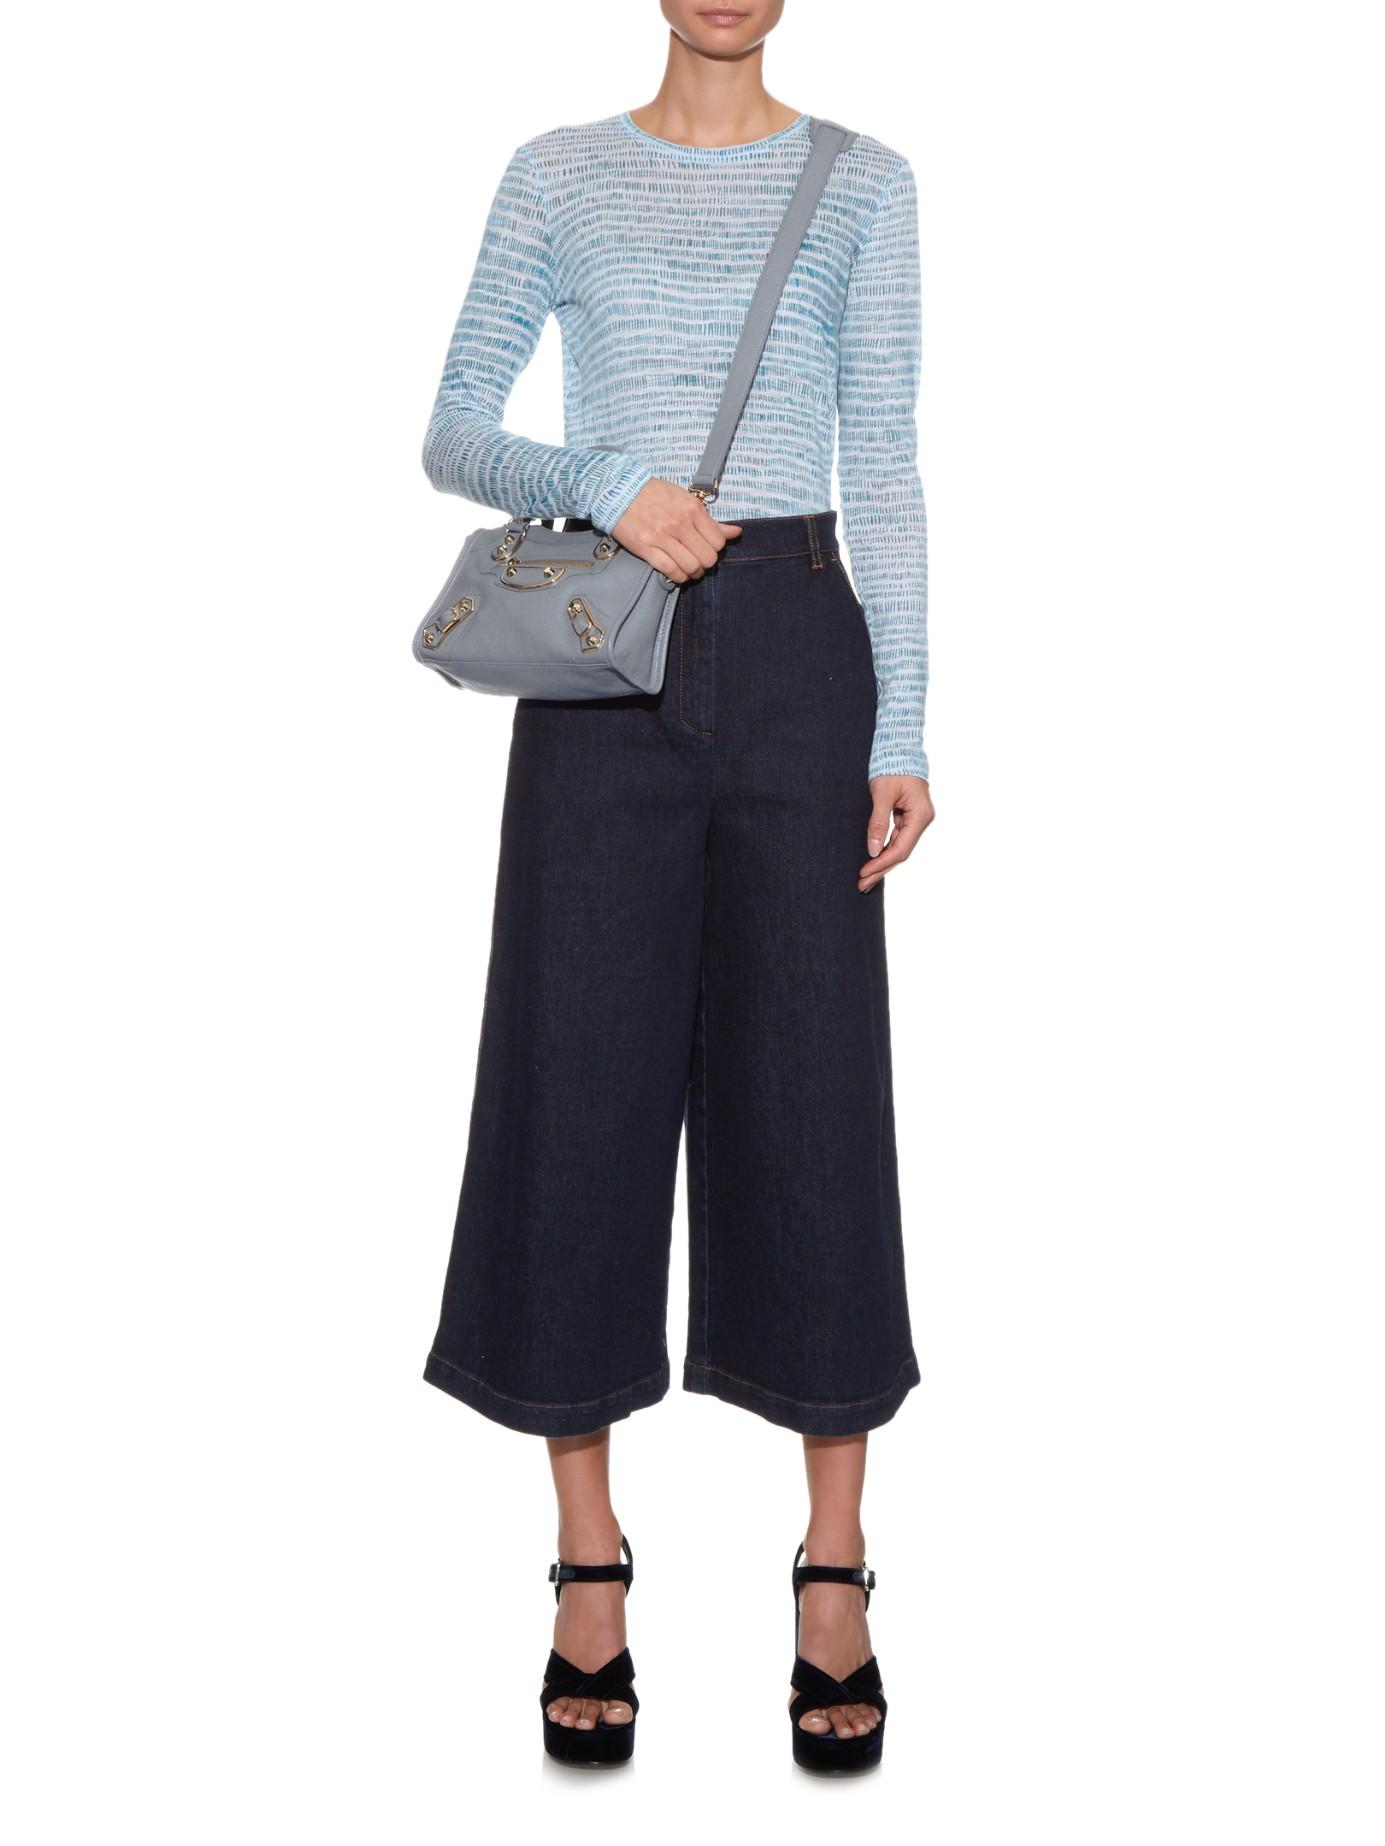 204059cf94d7 Lyst - Balenciaga Classic Mini City Metallic-Edge Cross-body Bag in Blue